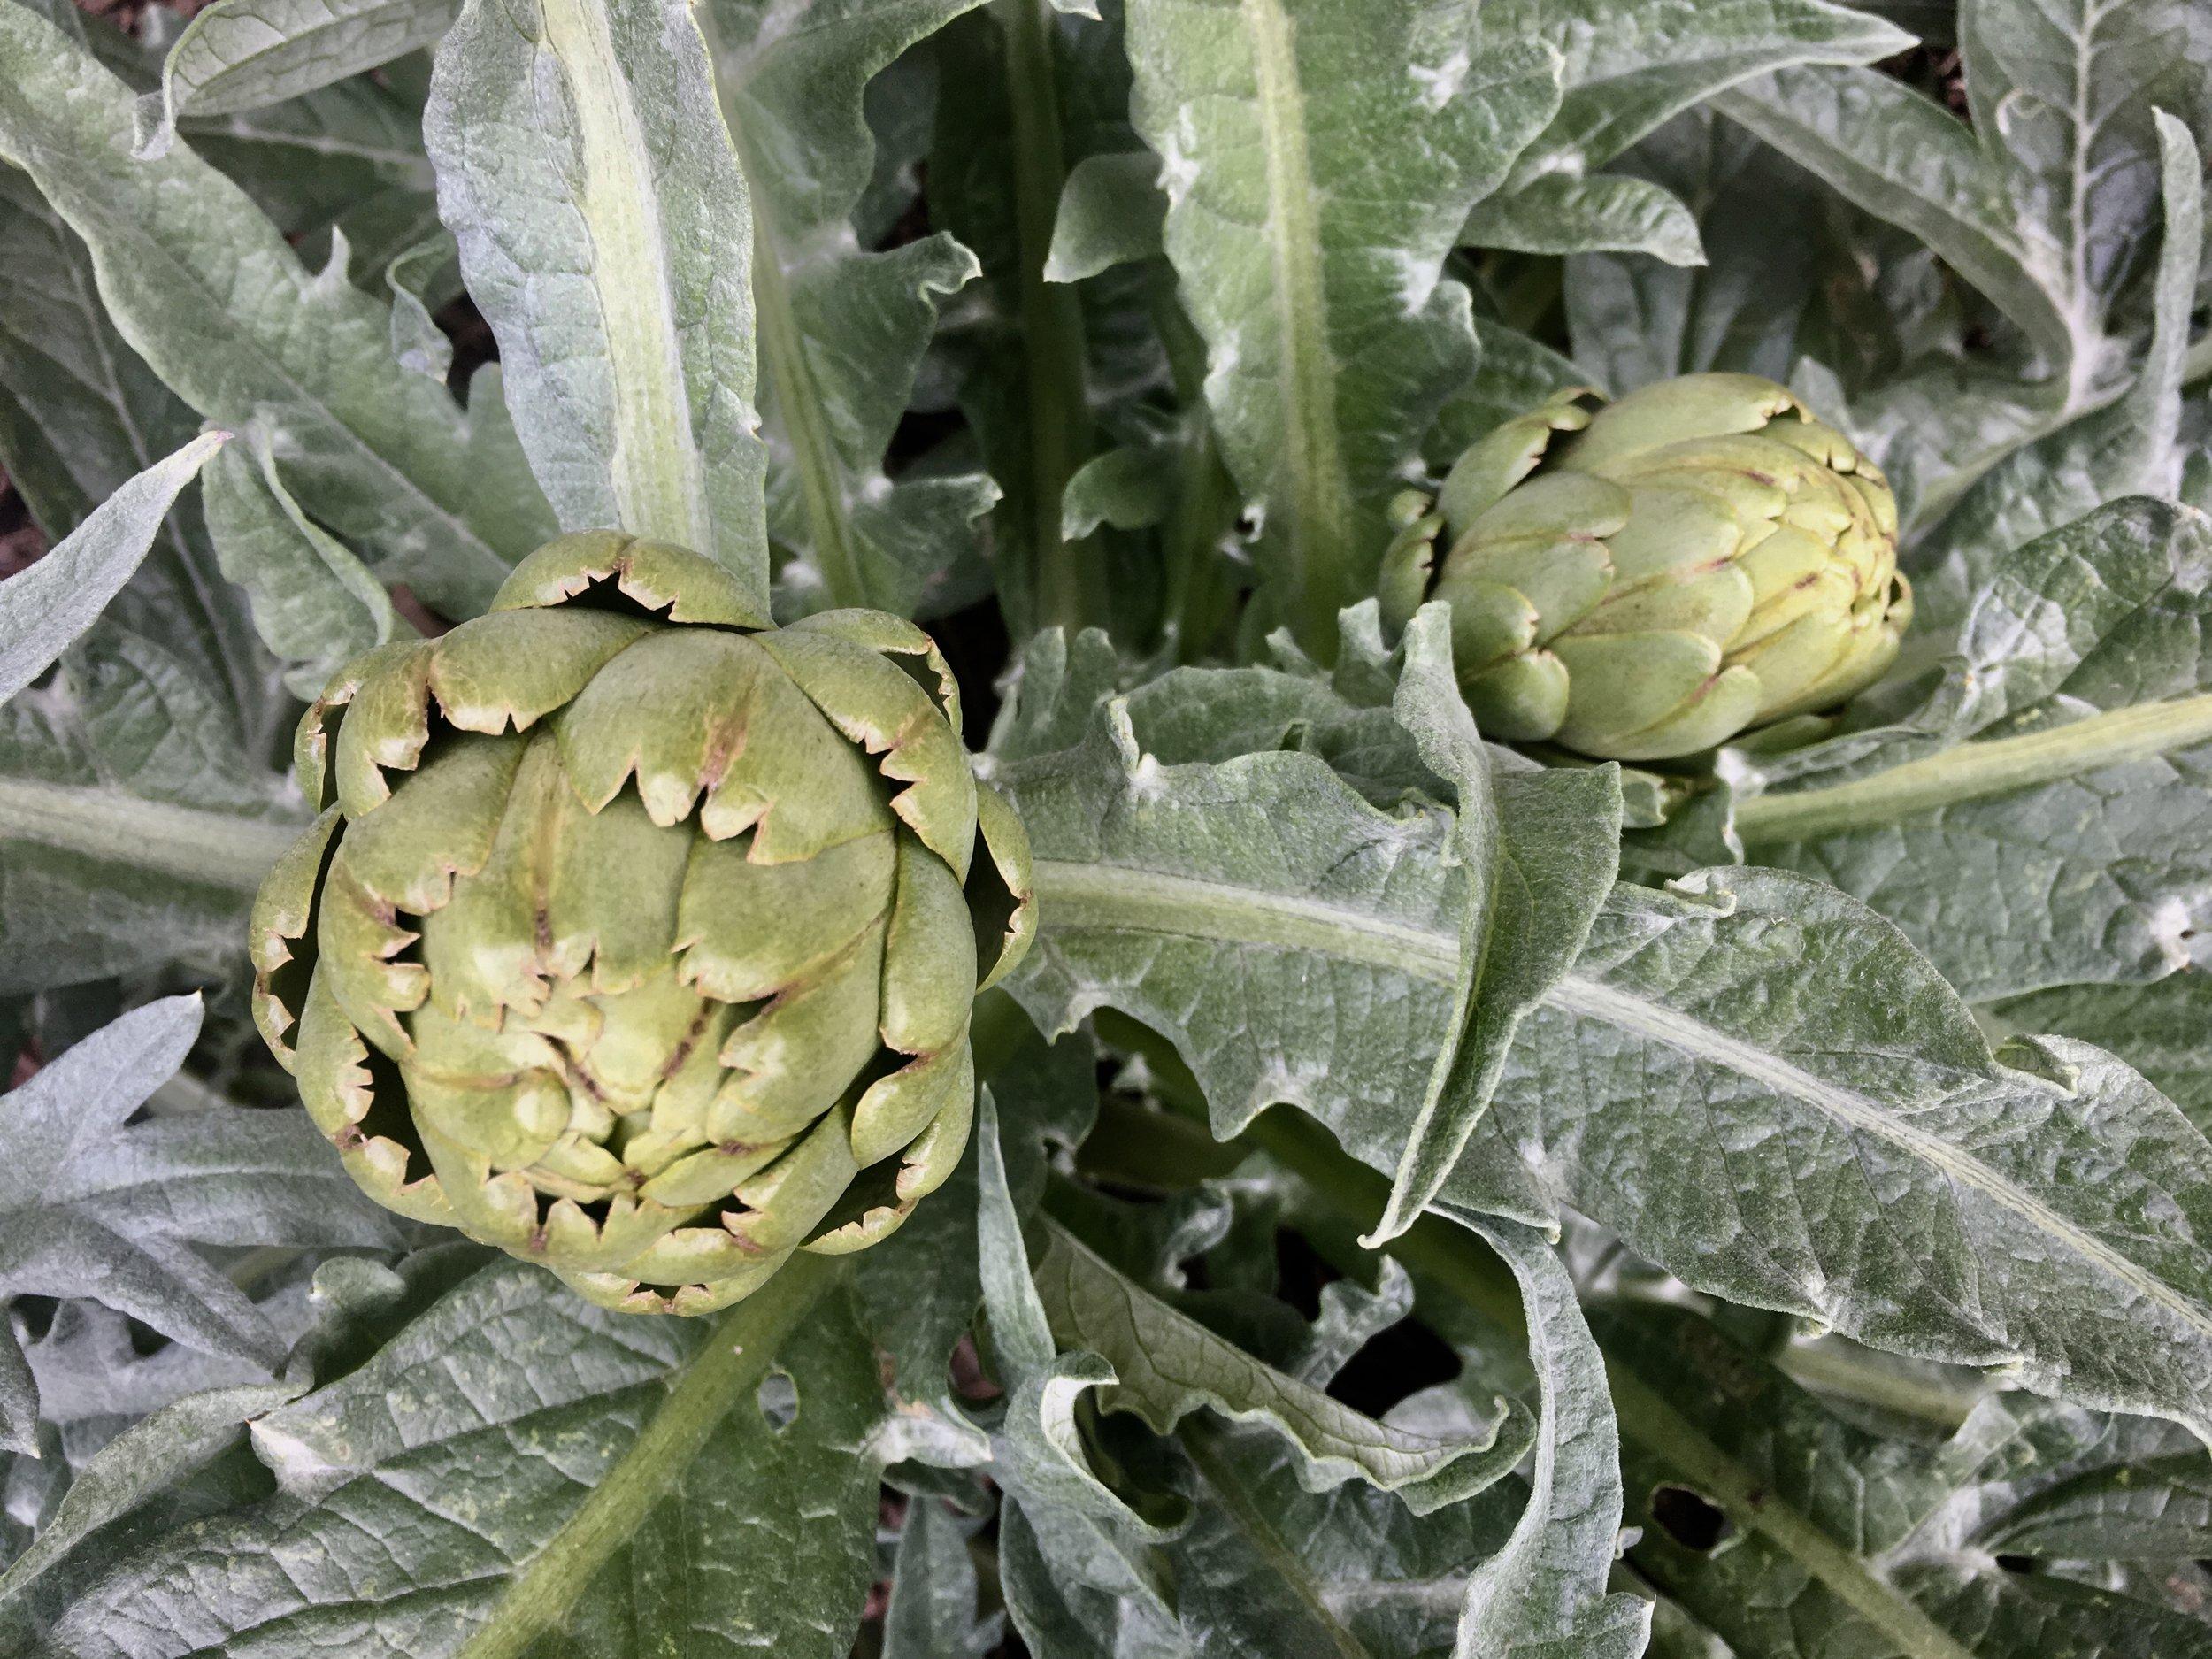 A second crop of artichokes.